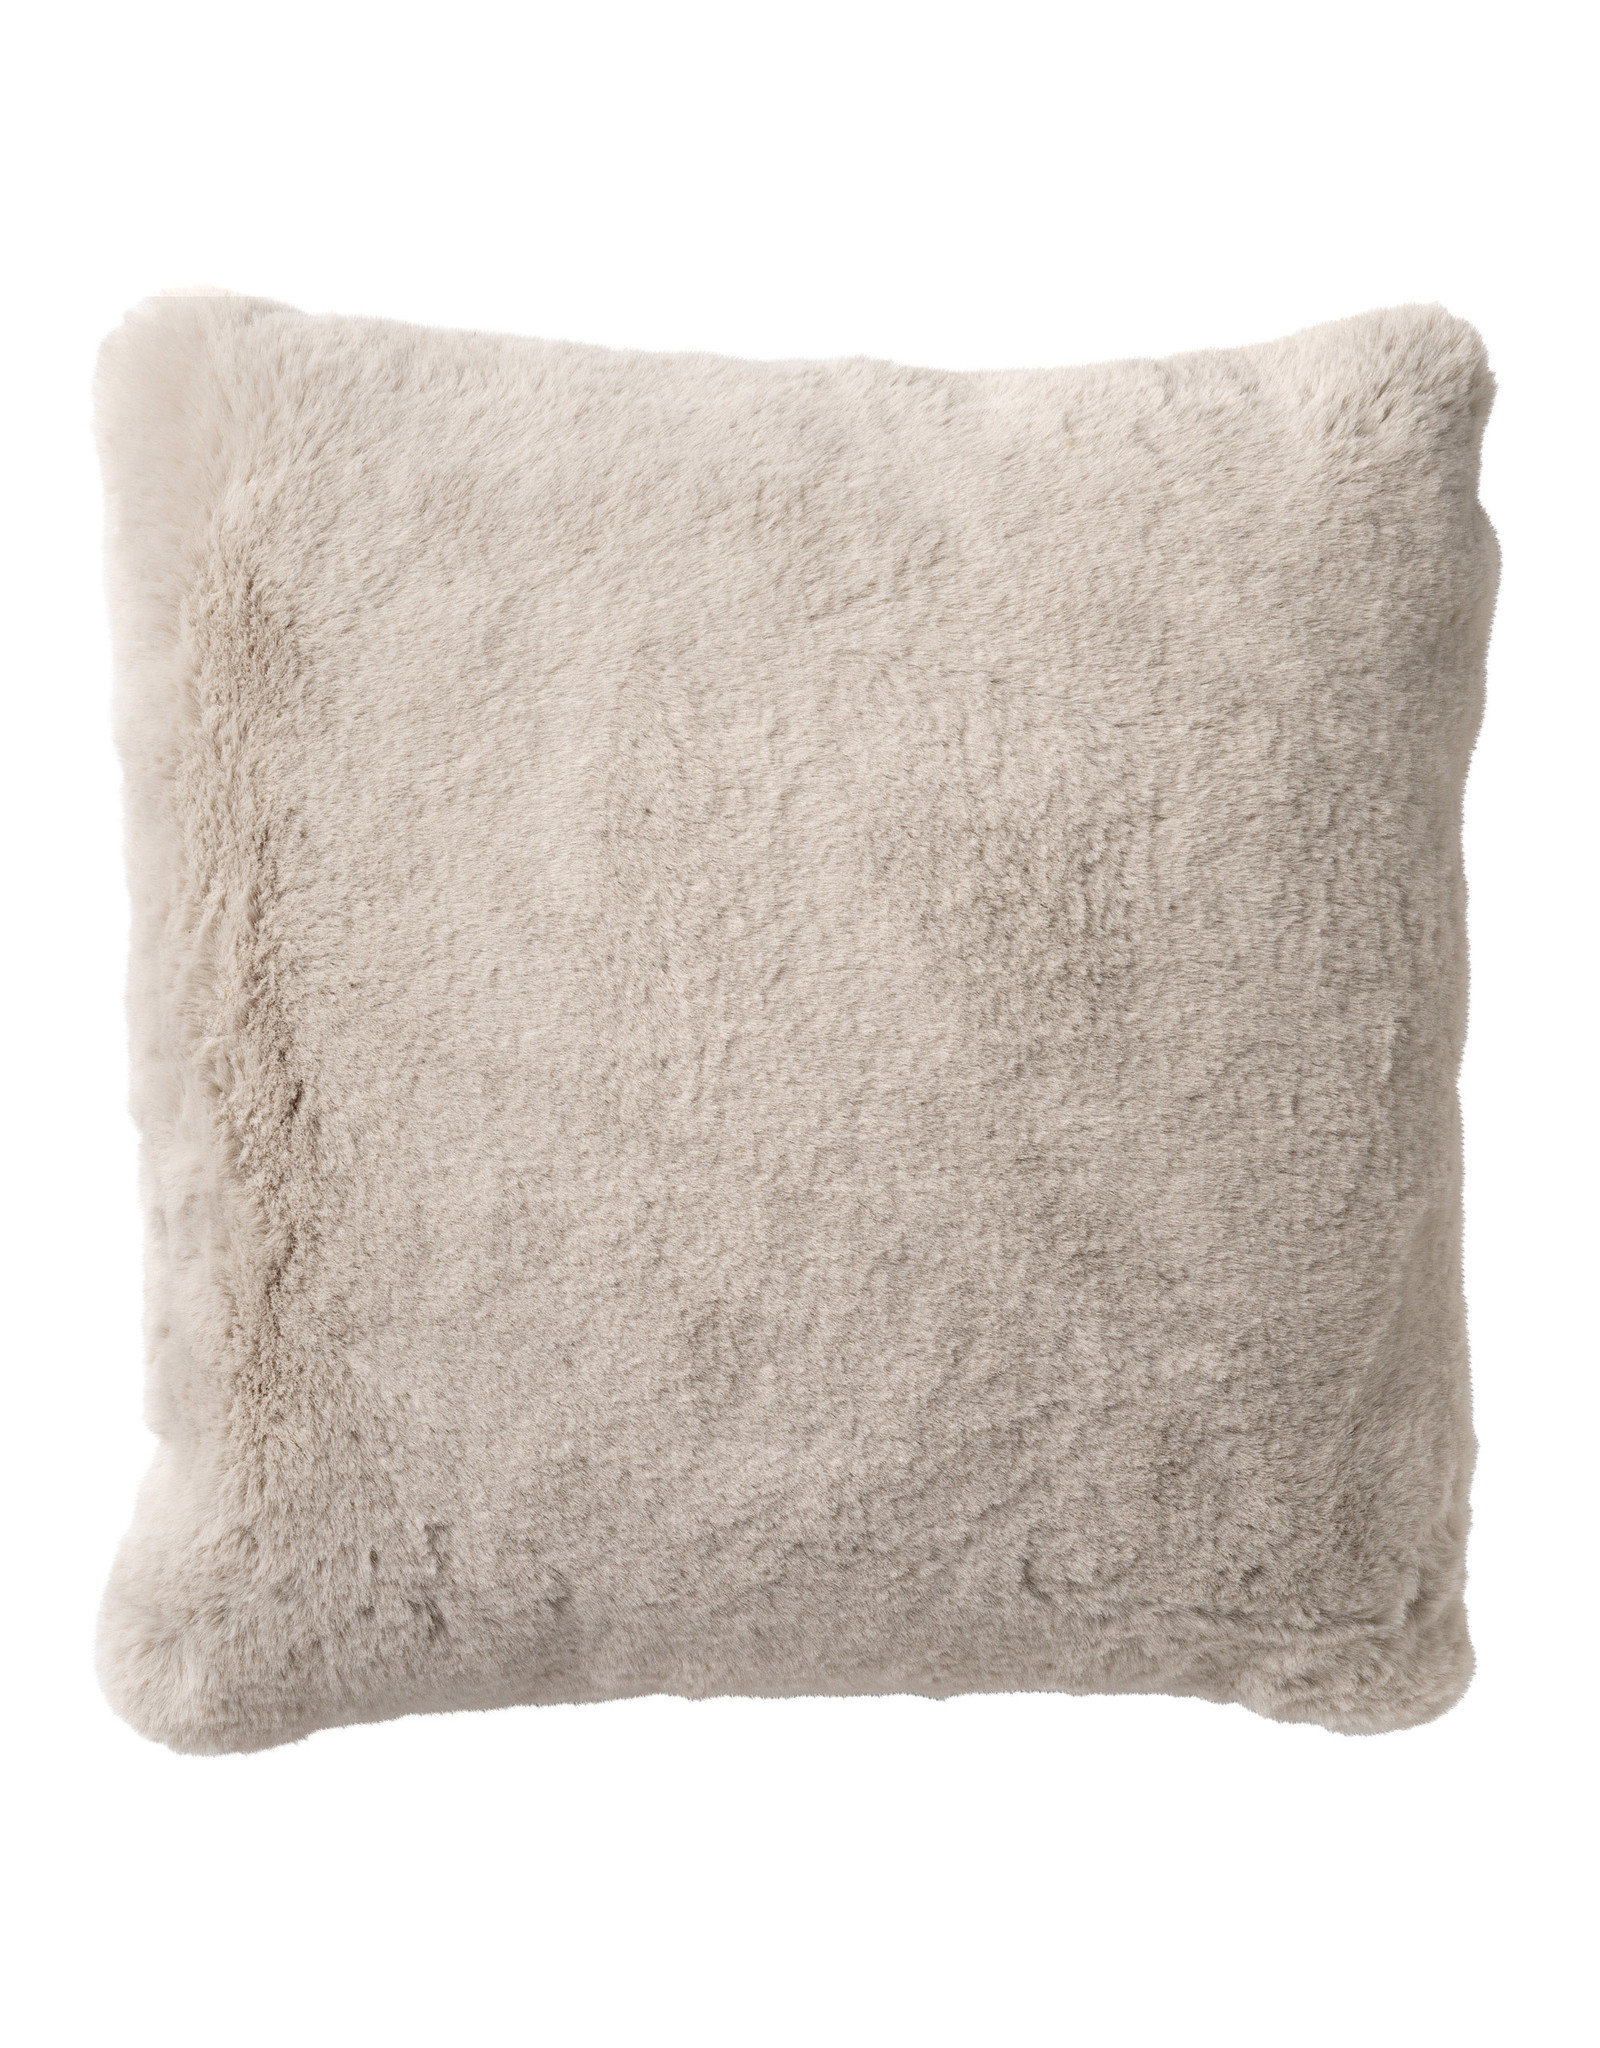 Dutch Decor Kussen - Zaya Pumice Stone